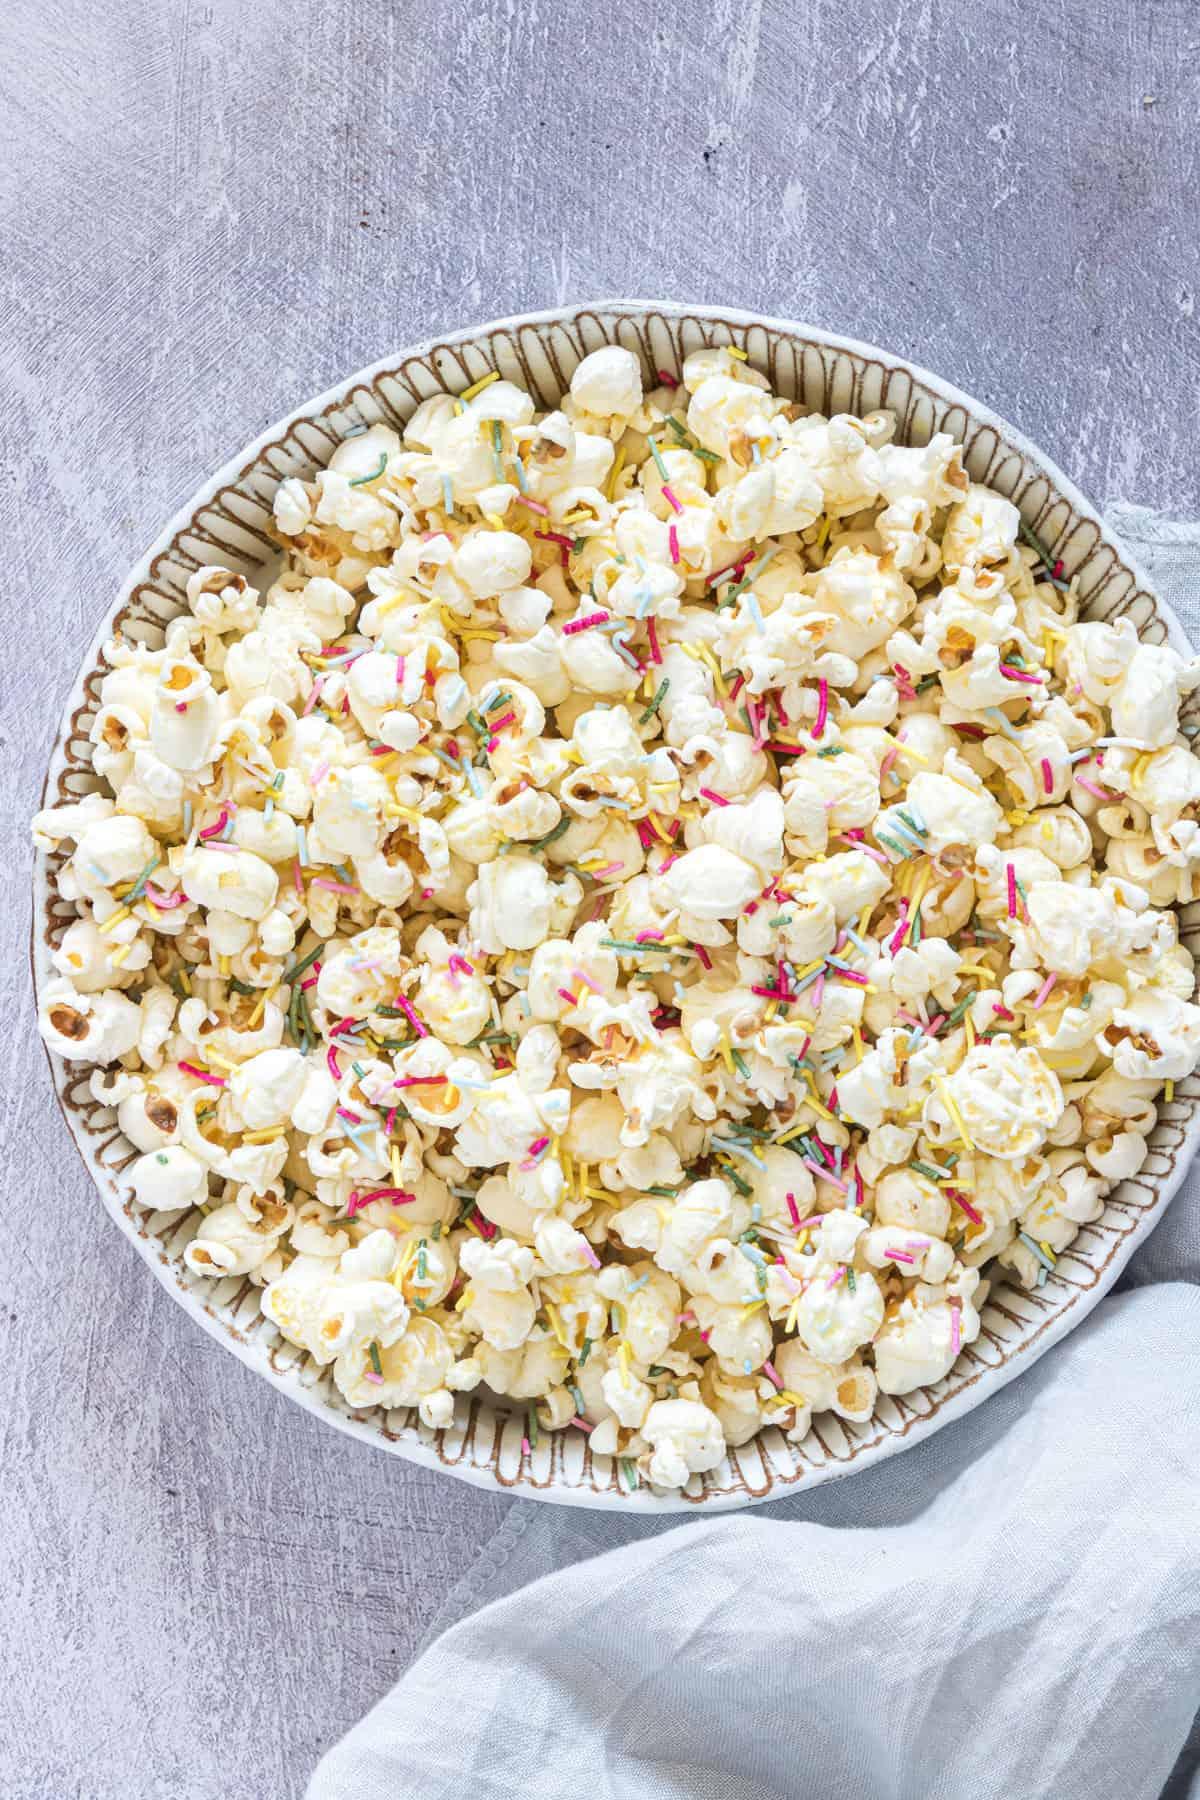 Funfetti popcorn in a bowl on a table